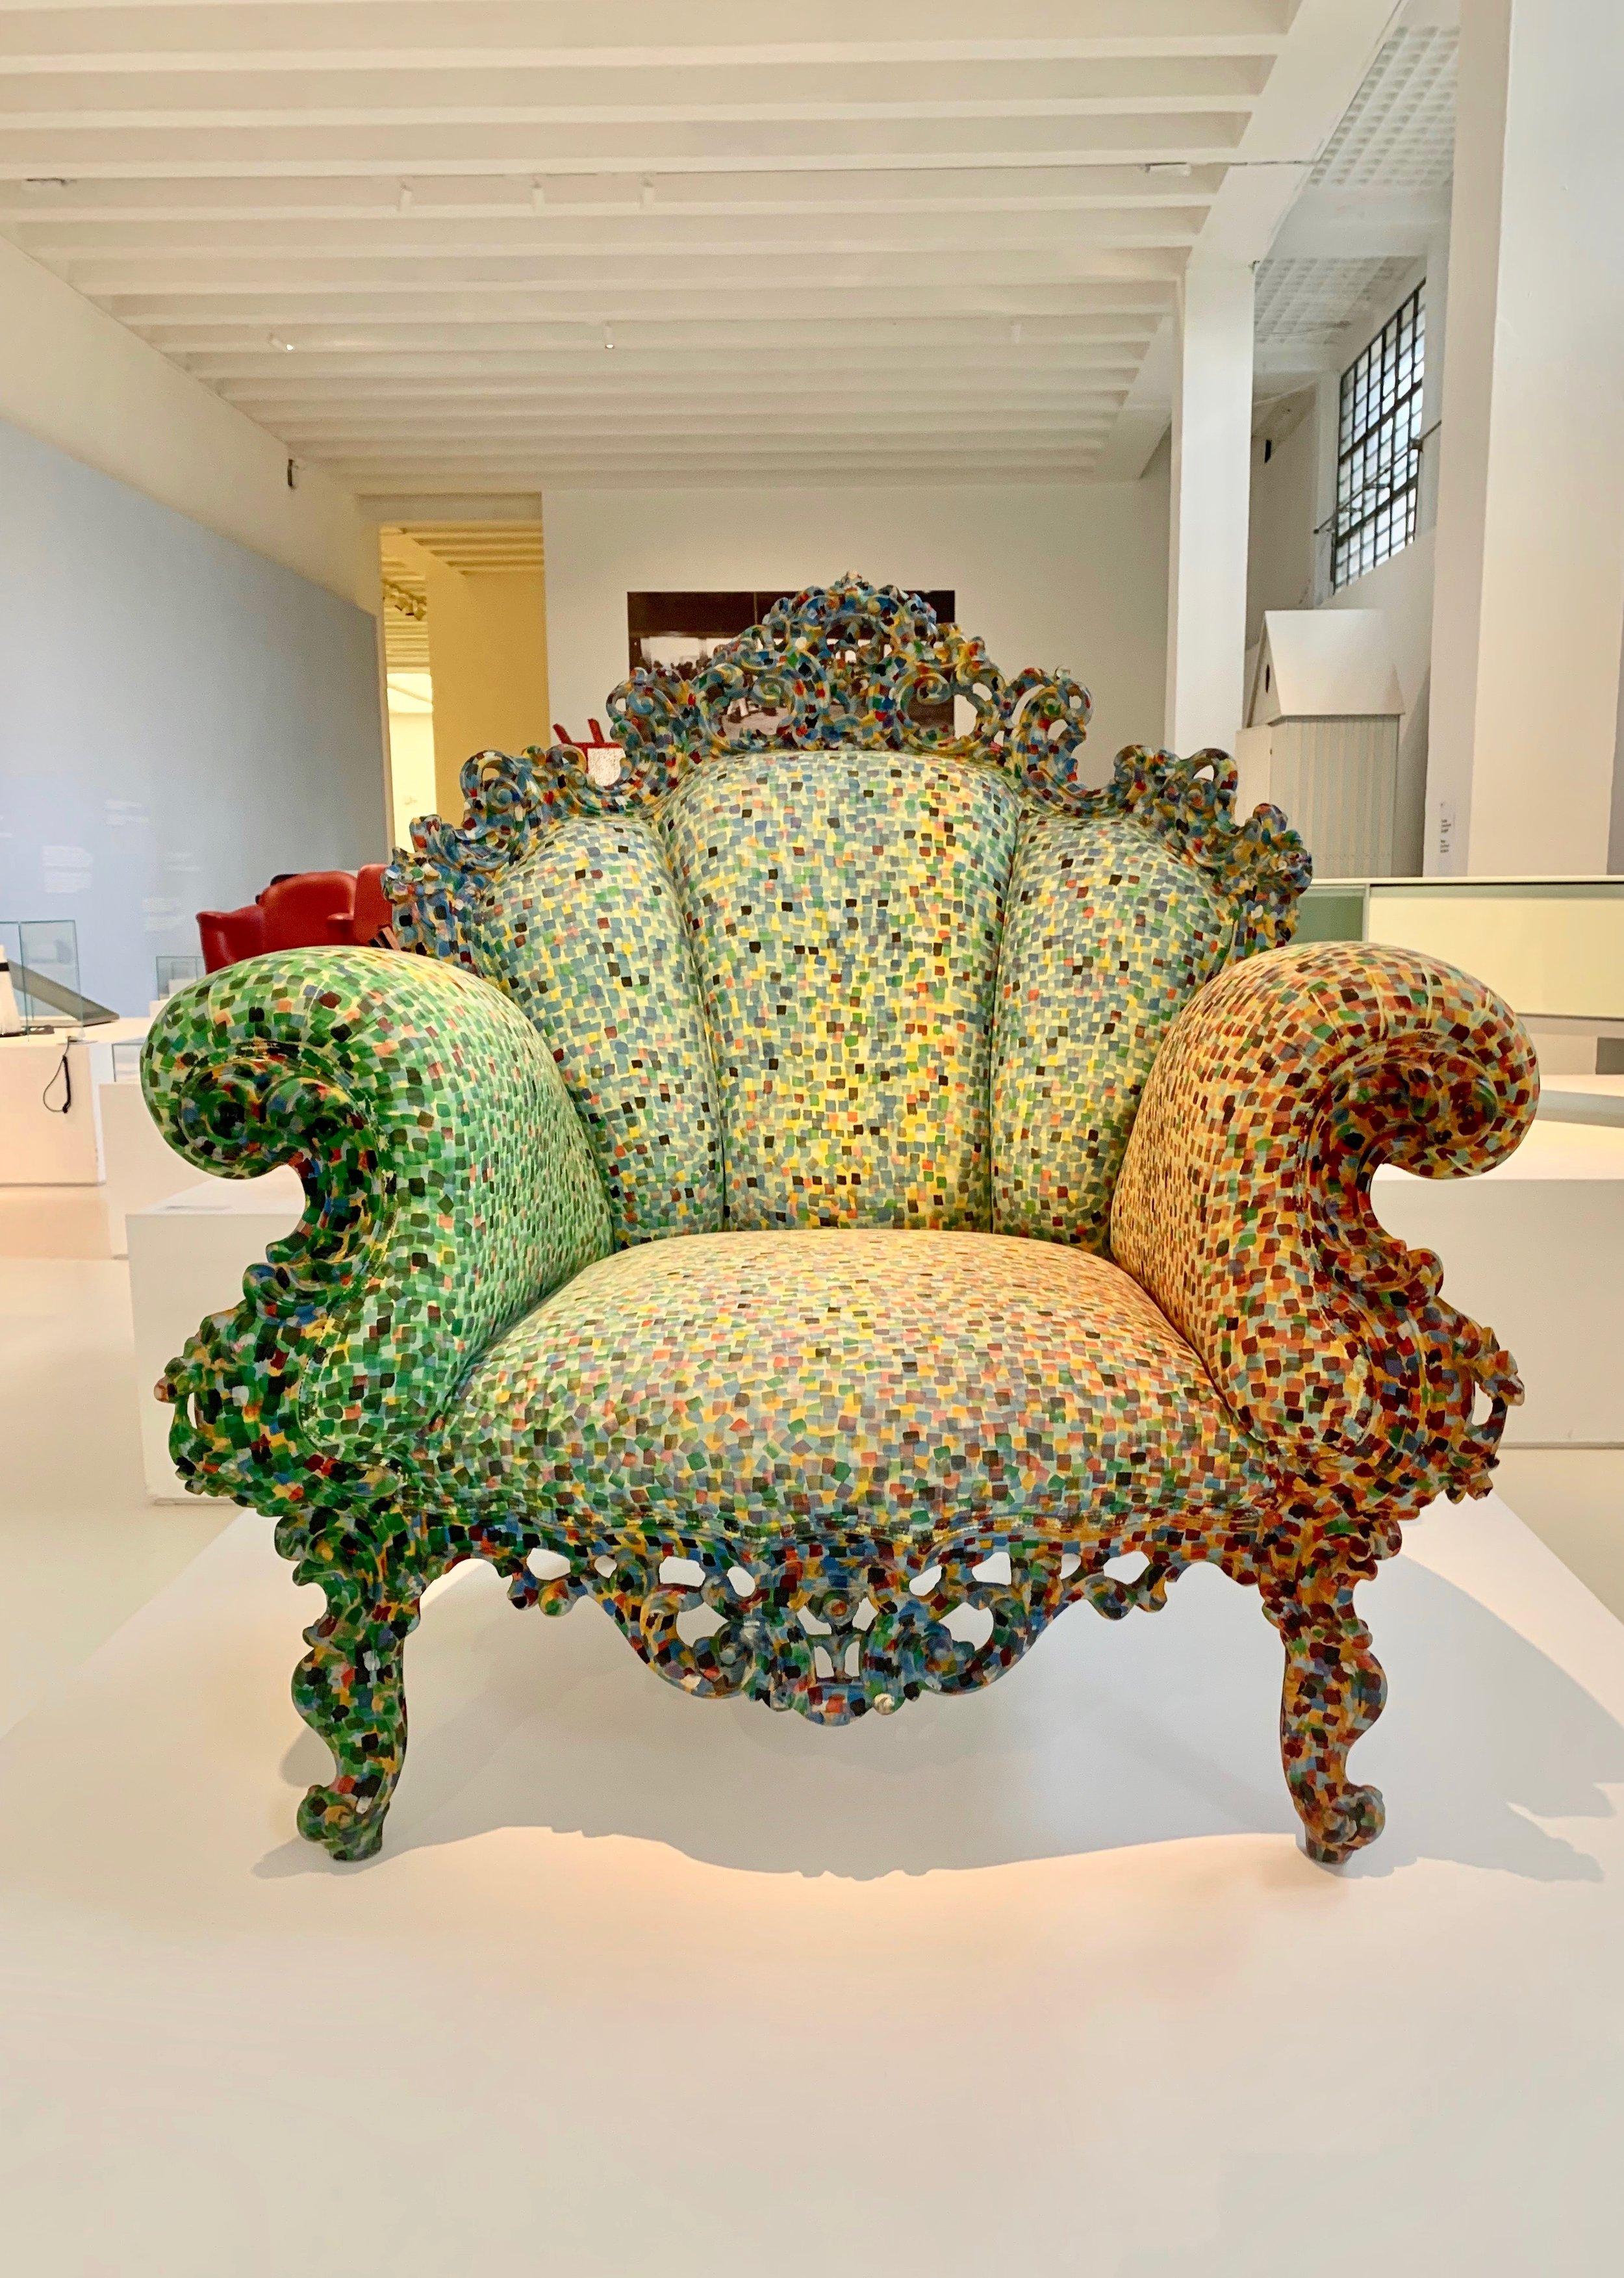 Museum Of Italian Design - Italian Mid Century Modern Furniture Designitalia00047.jpeg